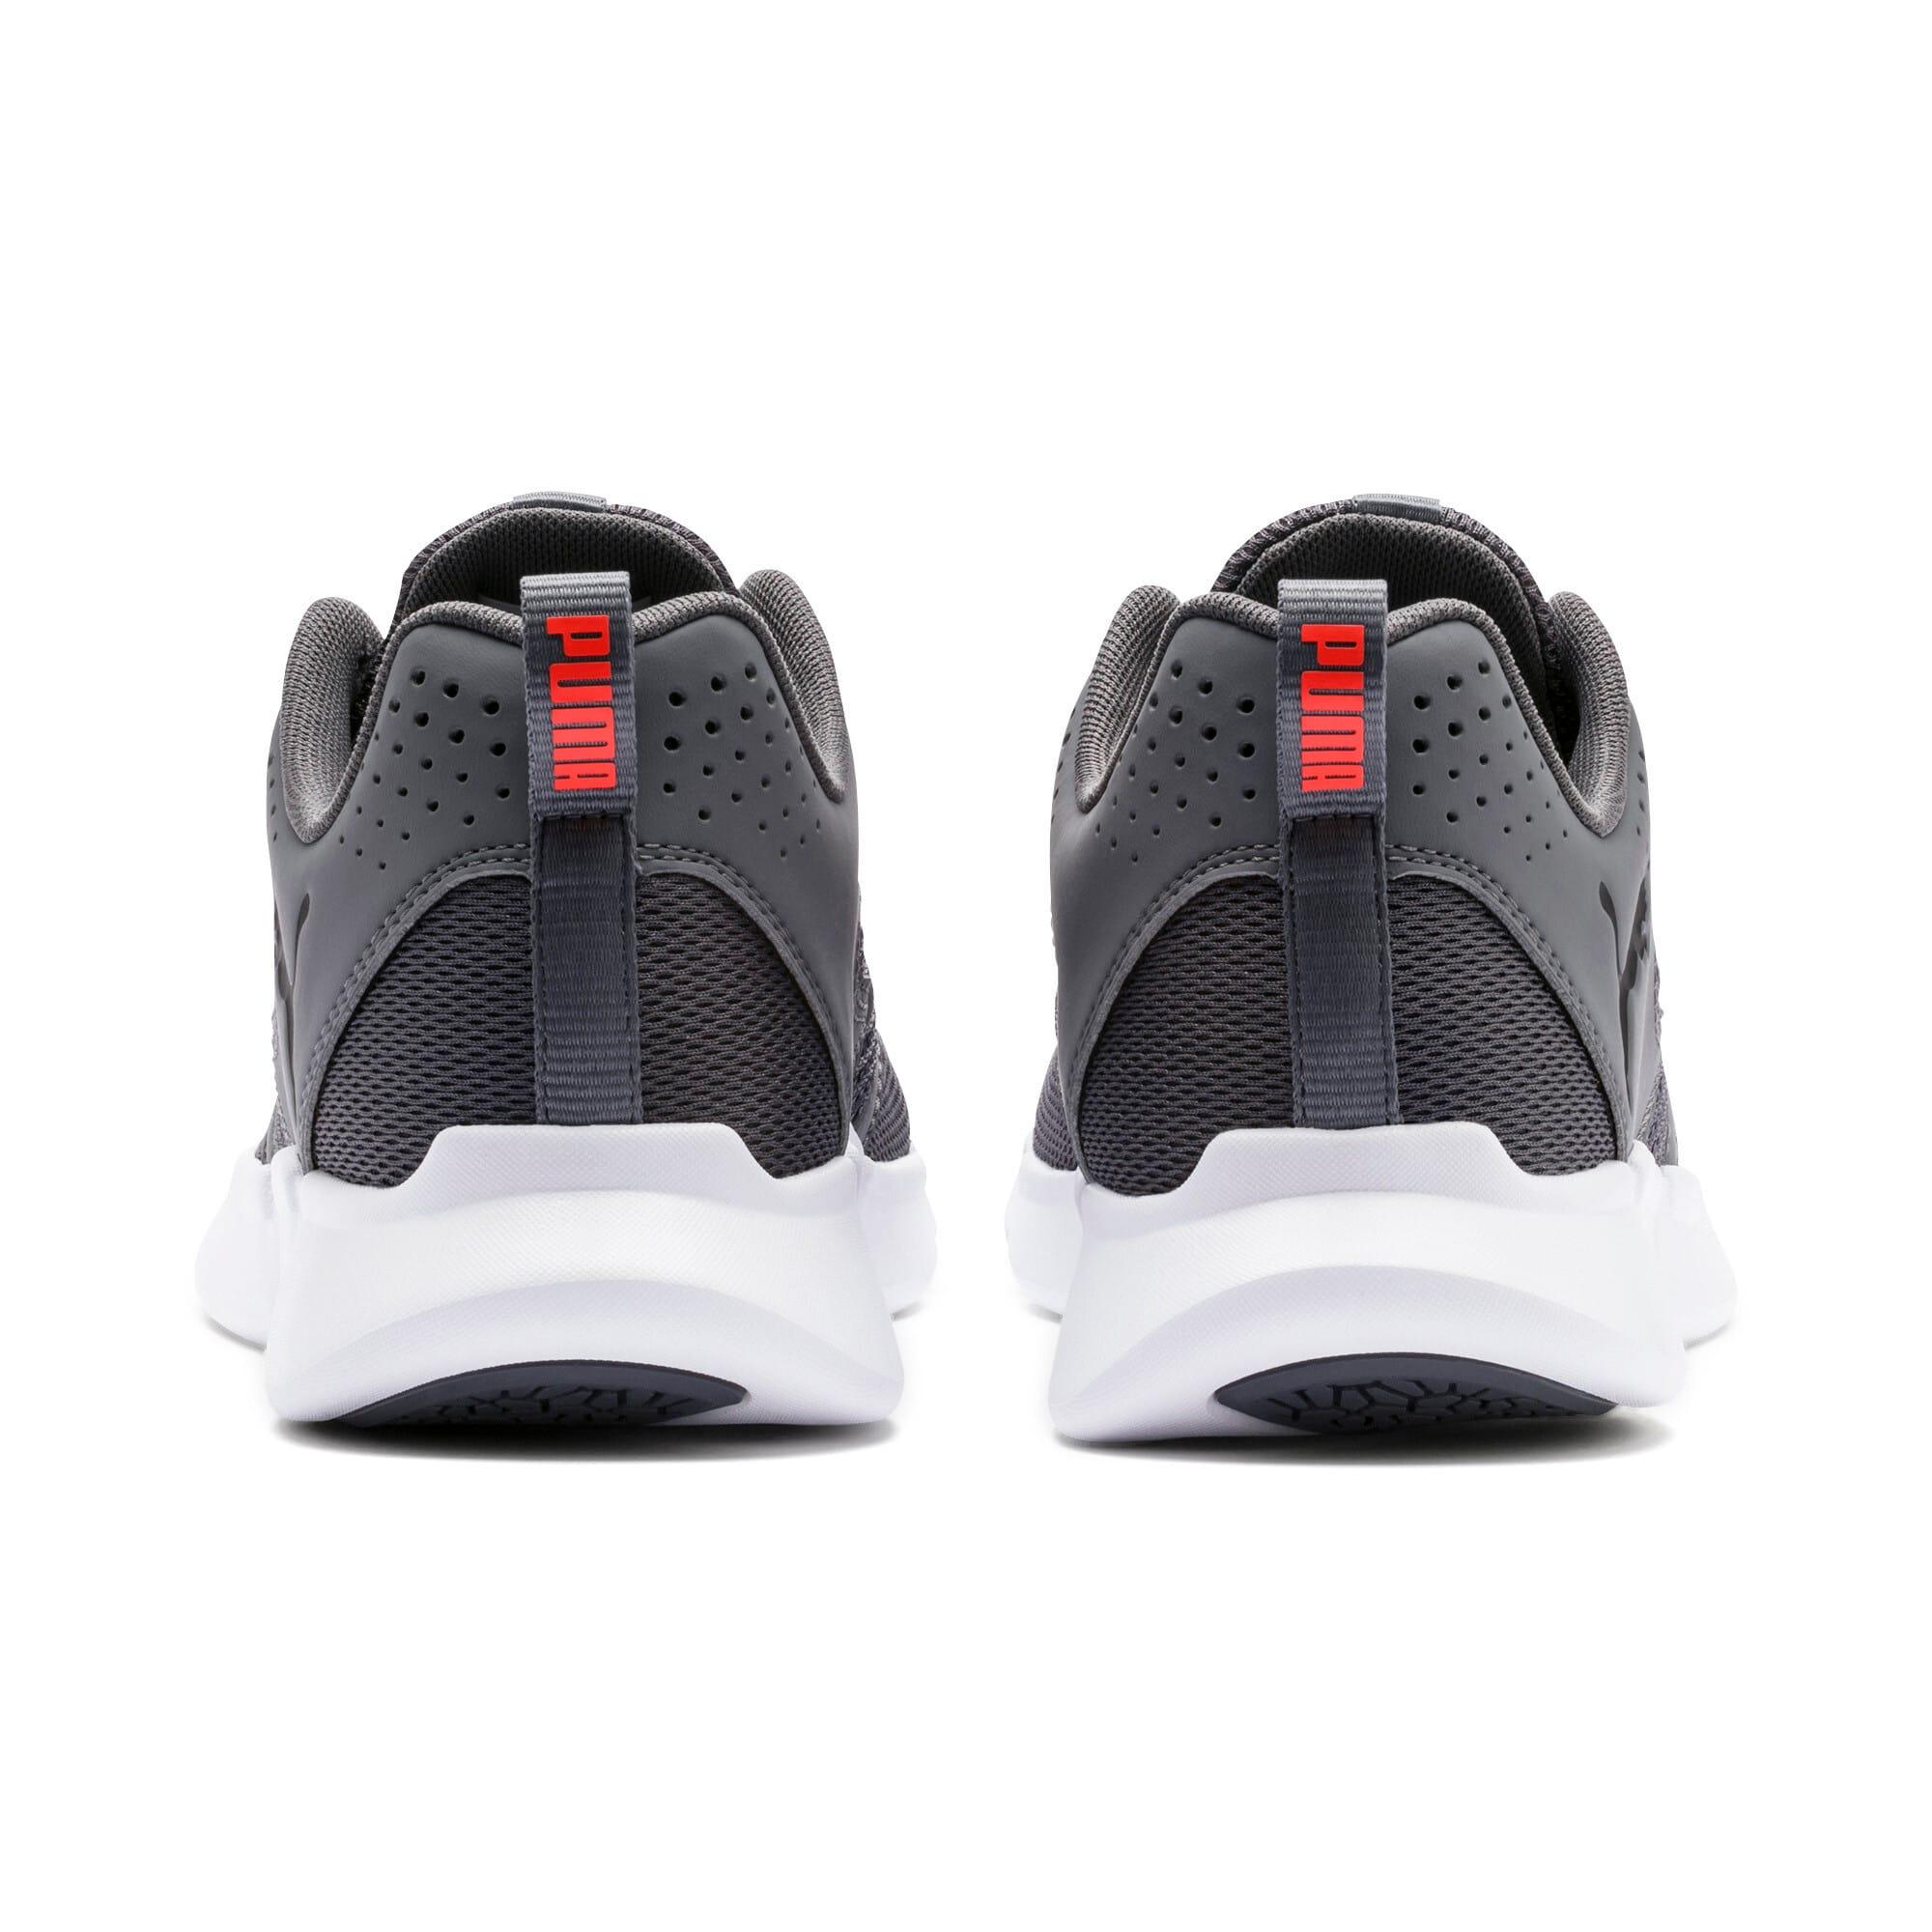 Thumbnail 7 of INTERFLEX Modern Running Shoes, CASTLEROCK-Black-Nrgy Red, medium-IND